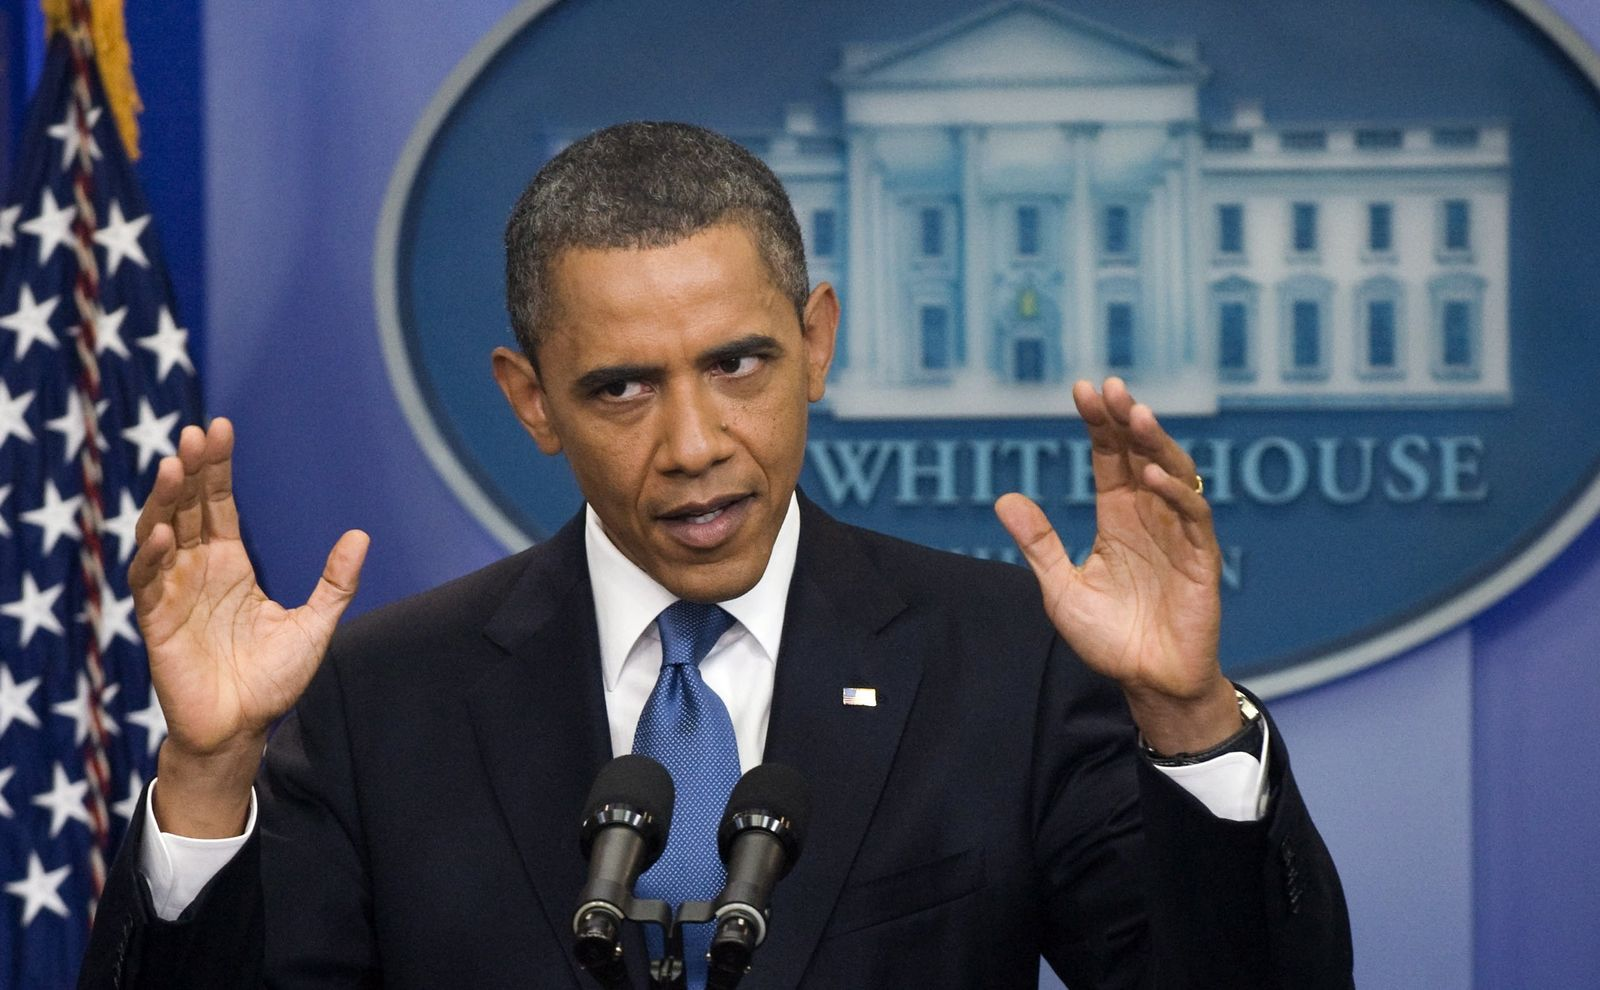 US President Barack Obama holds a press conference.